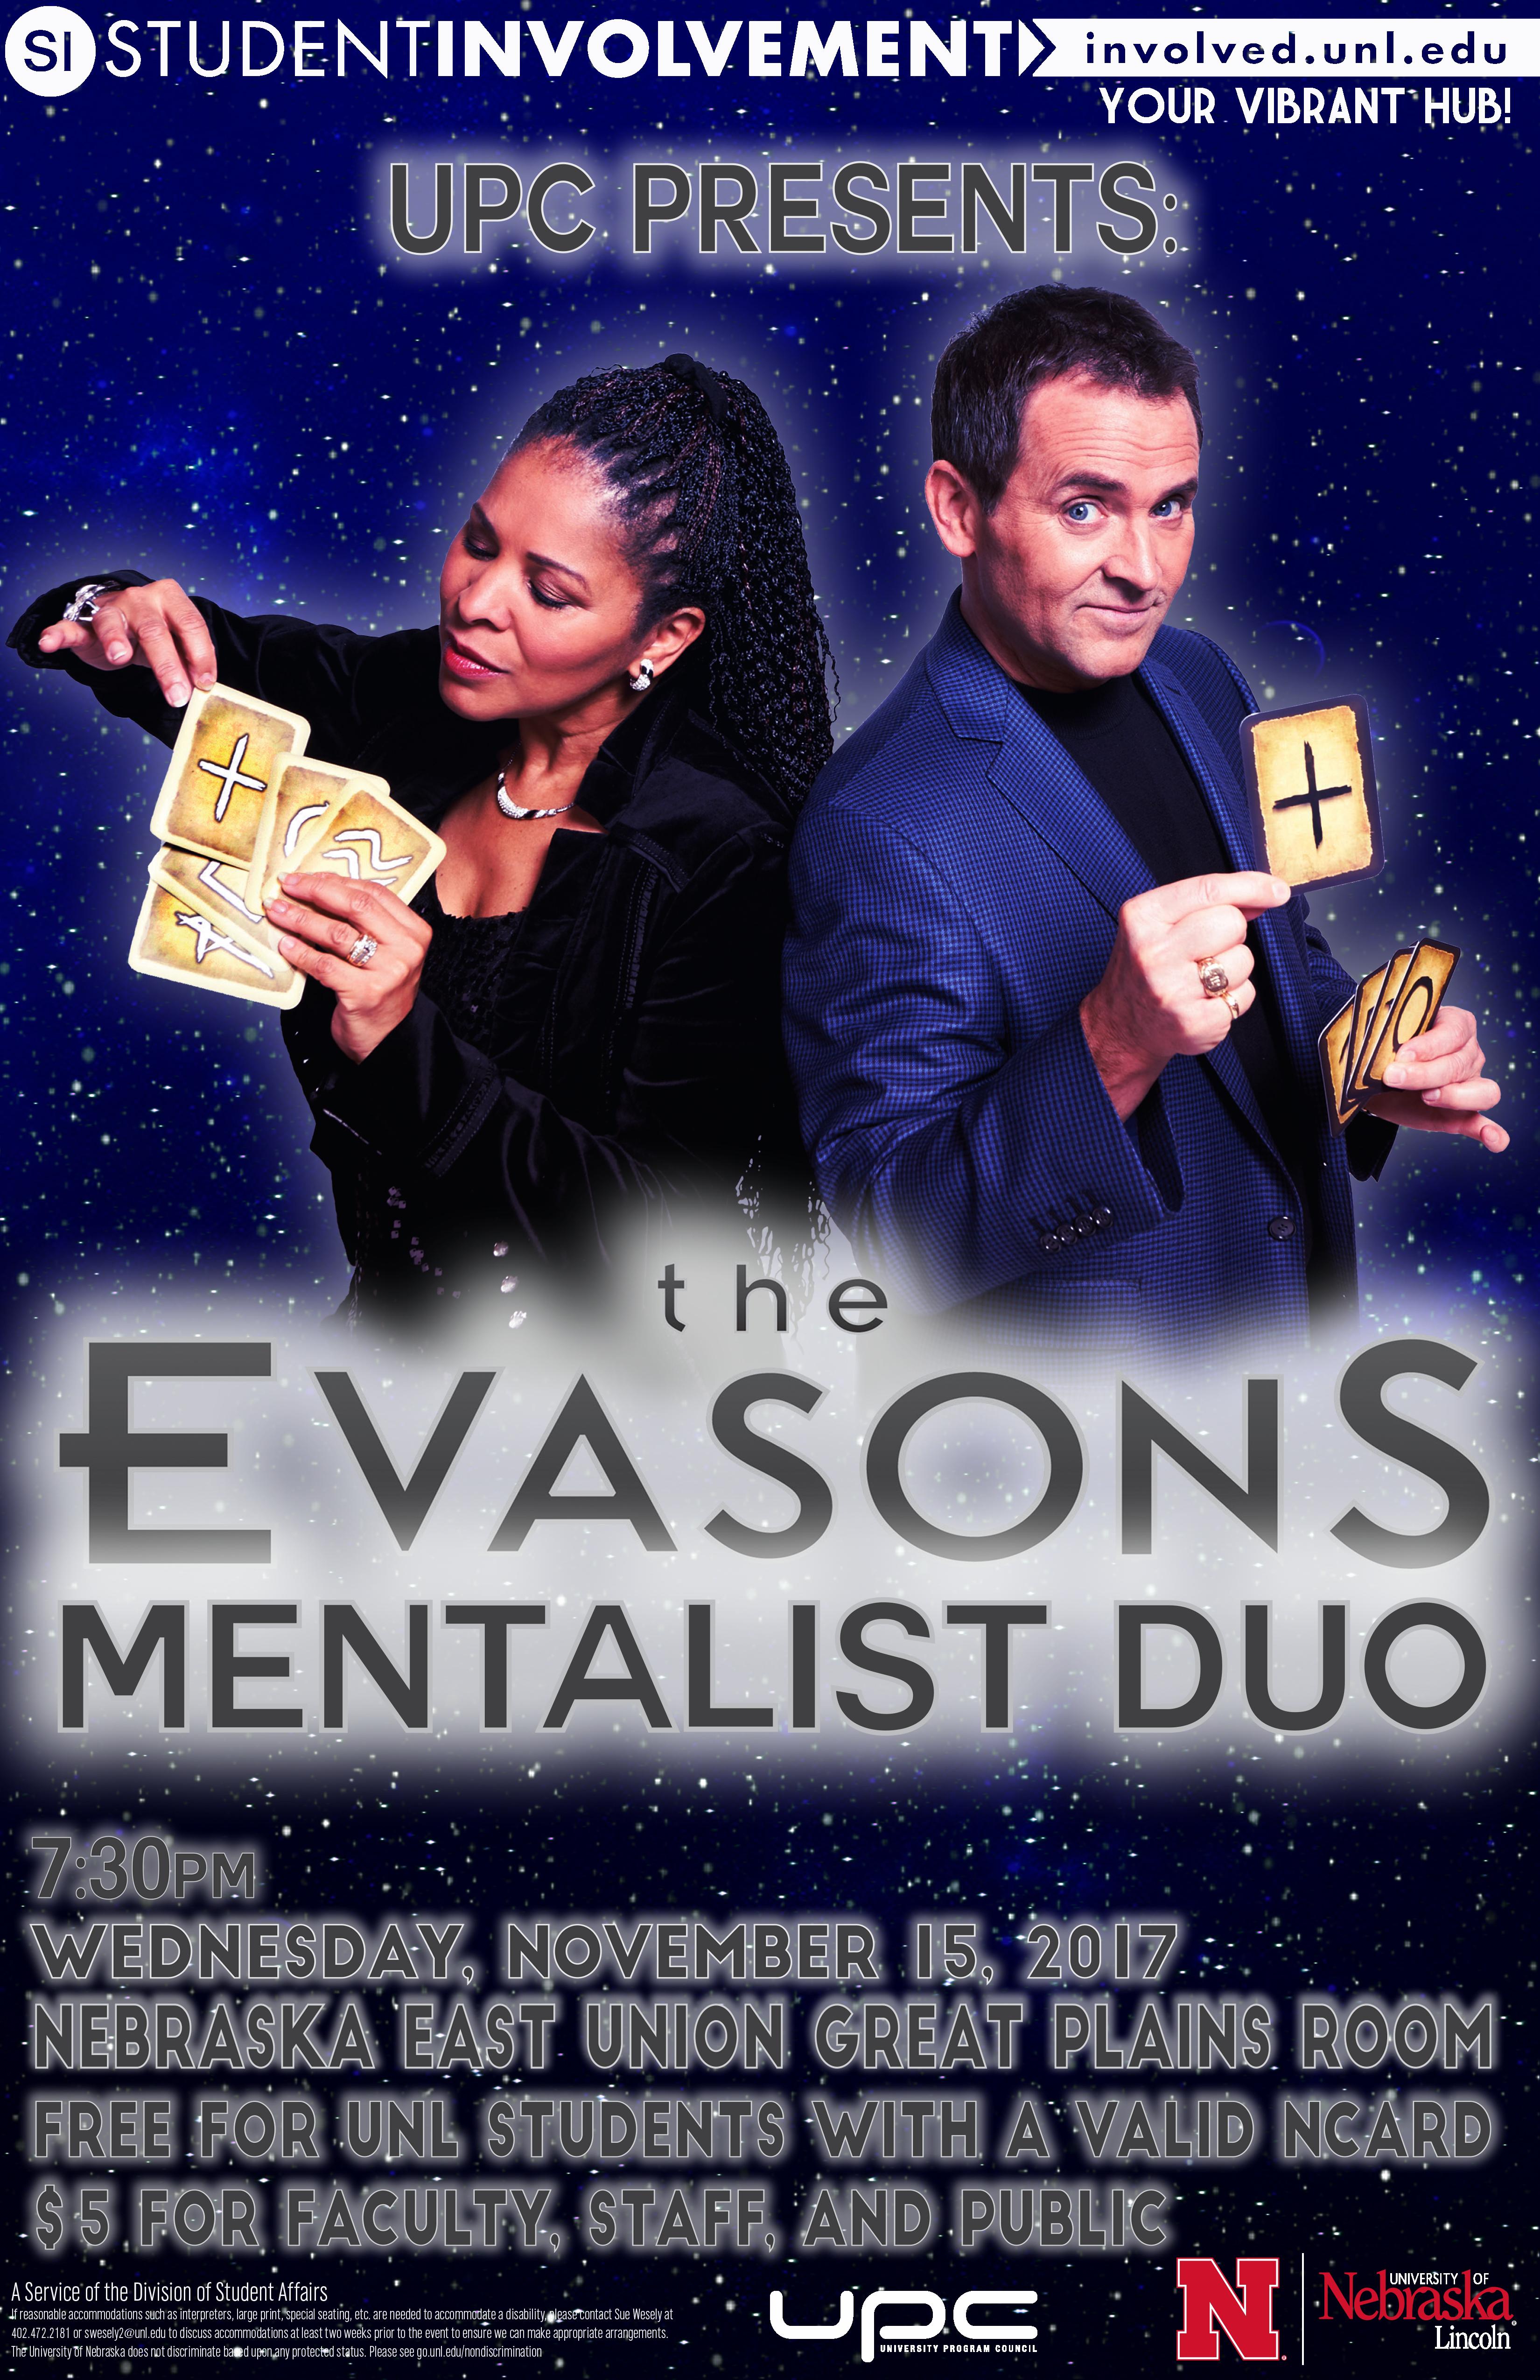 The Evasons Mentalist Duo